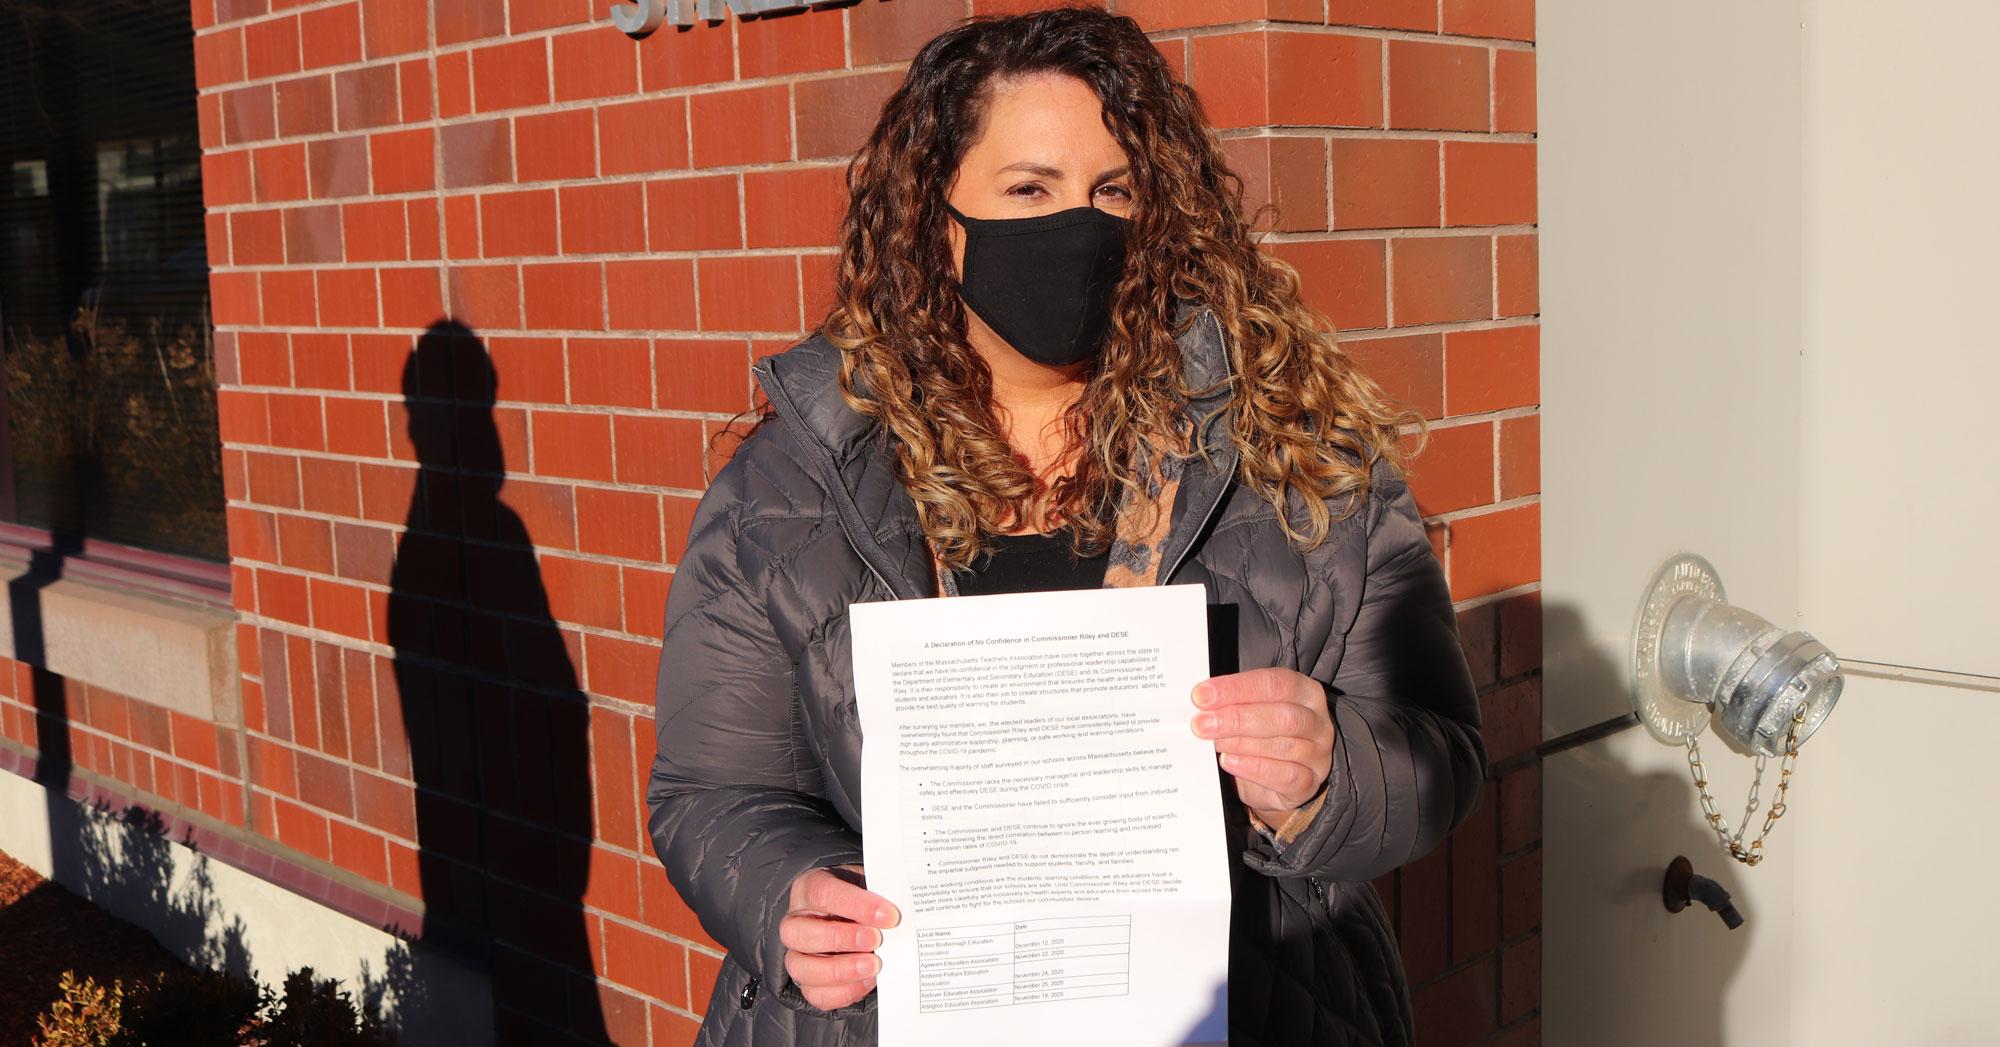 Malden Education Association President Deborah Gesualdo with the petition.